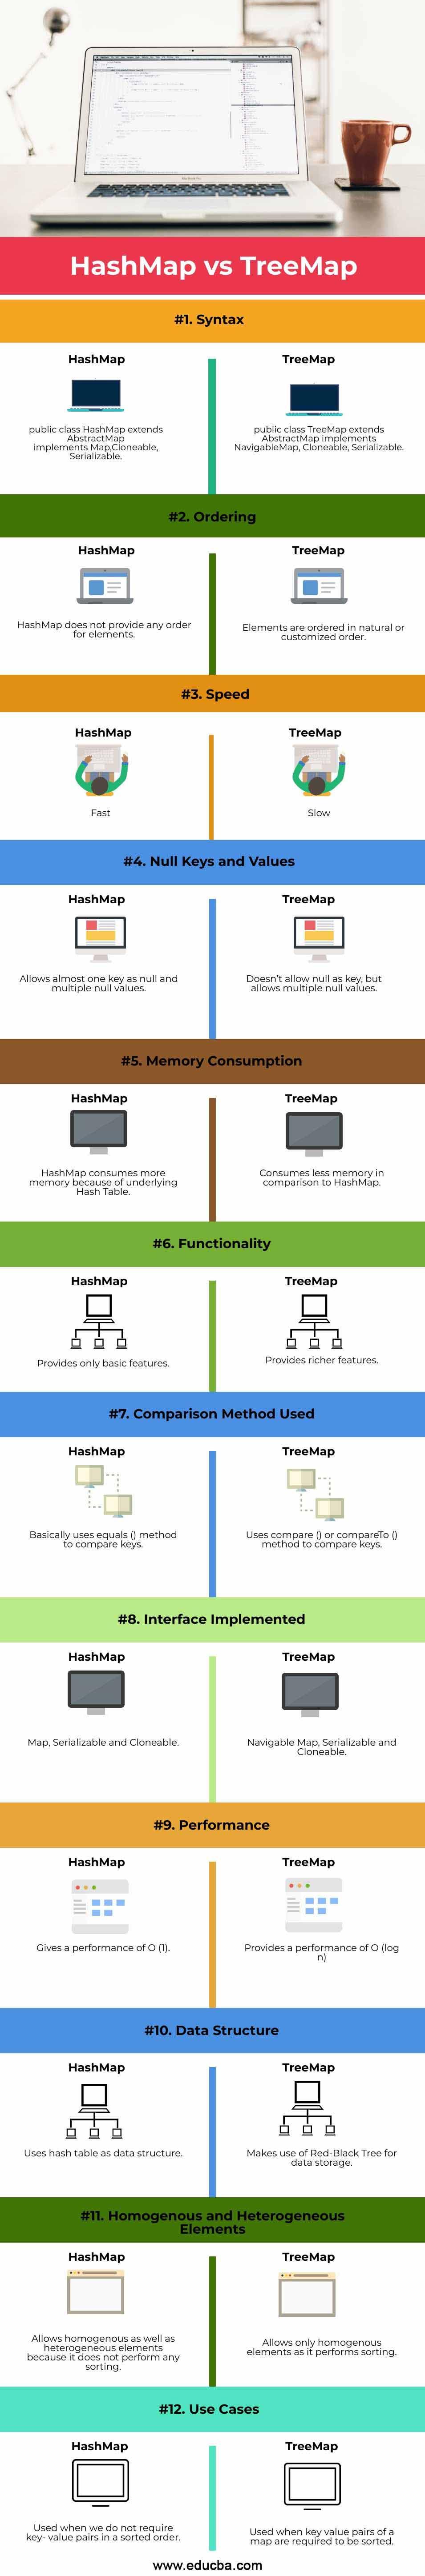 HashMap-vs-TreeMap-info